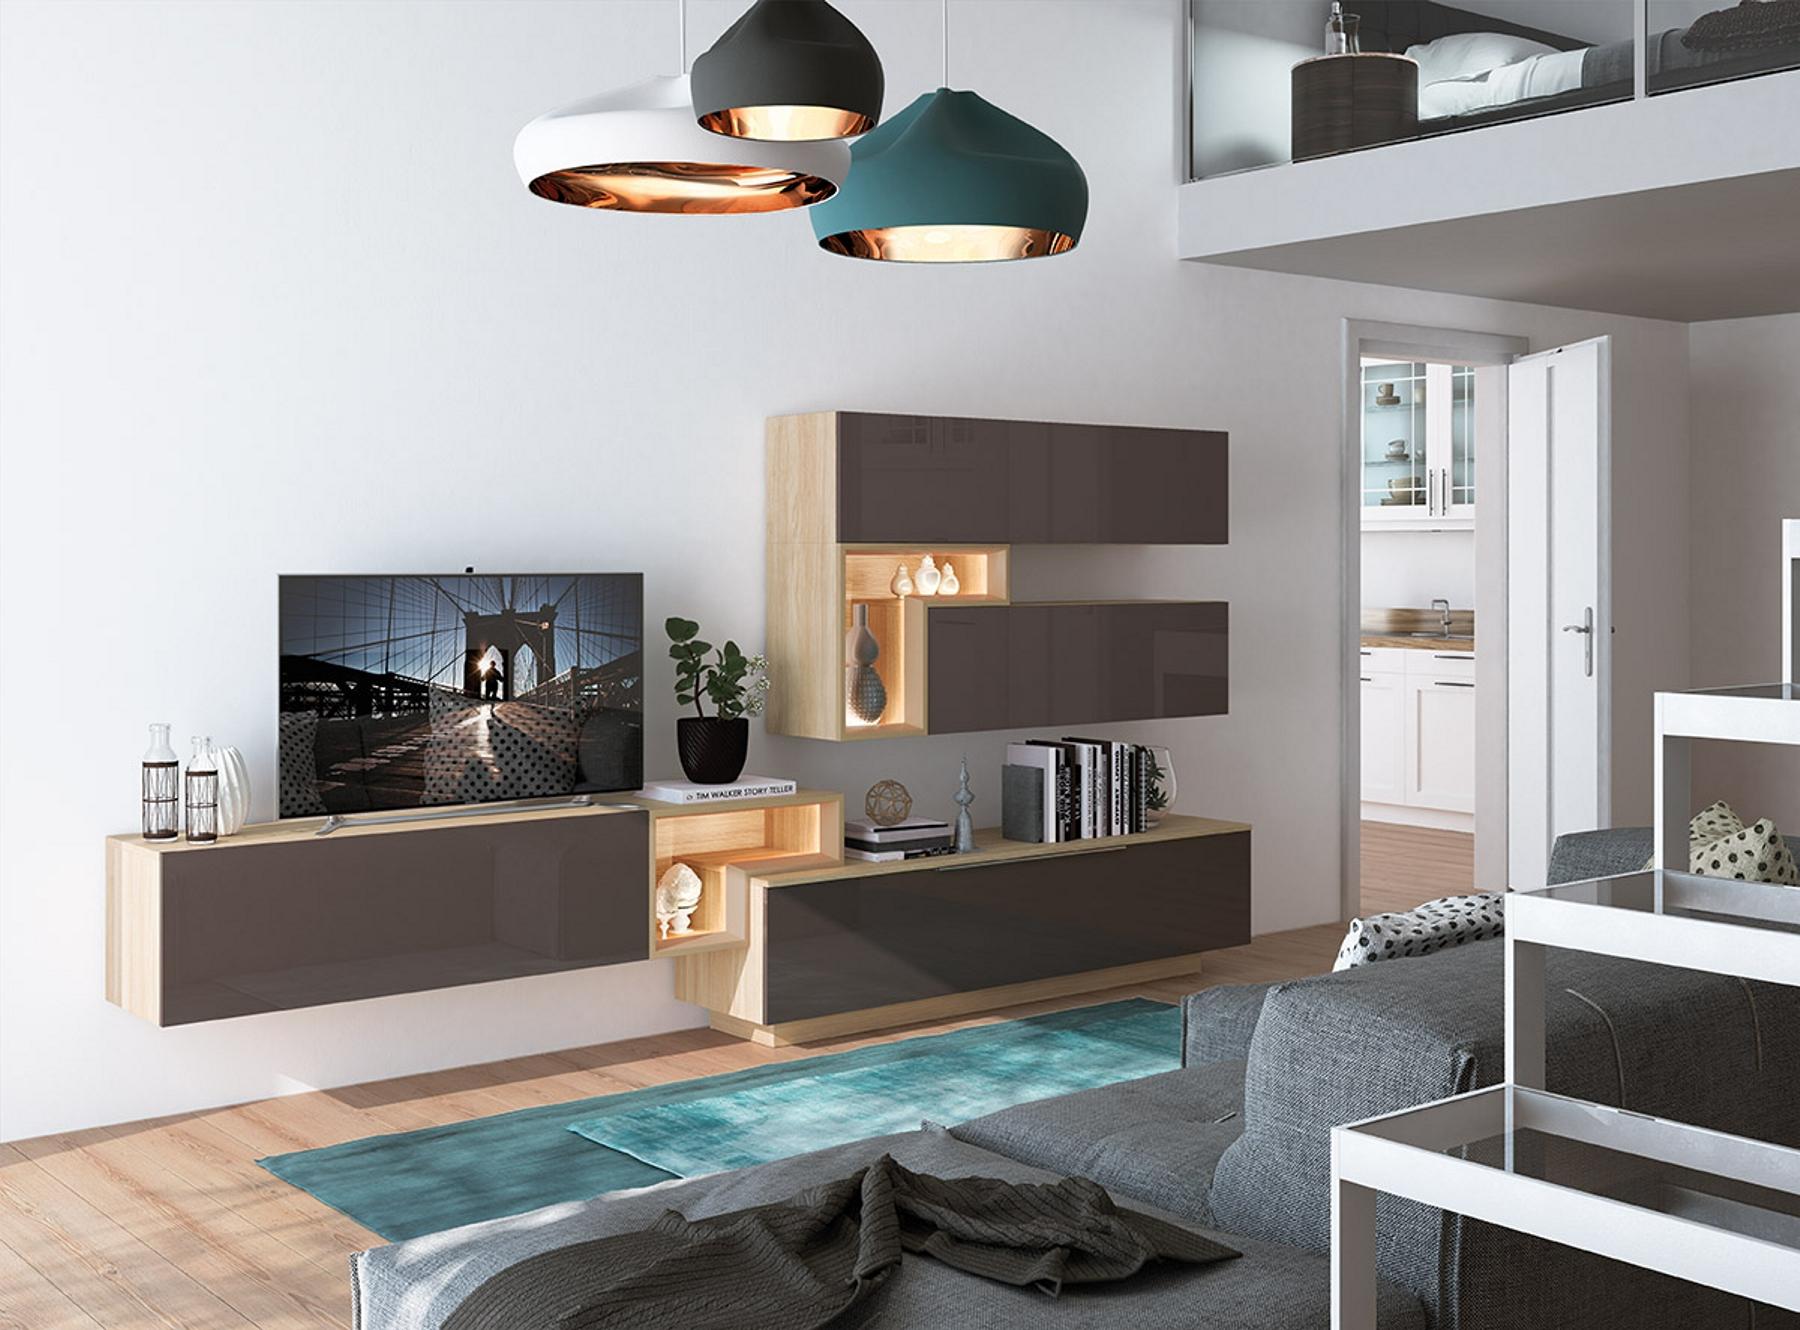 salon-moderno-Zion-3.0-muebles-paco-caballero-0907-5c8d32d81f1cf